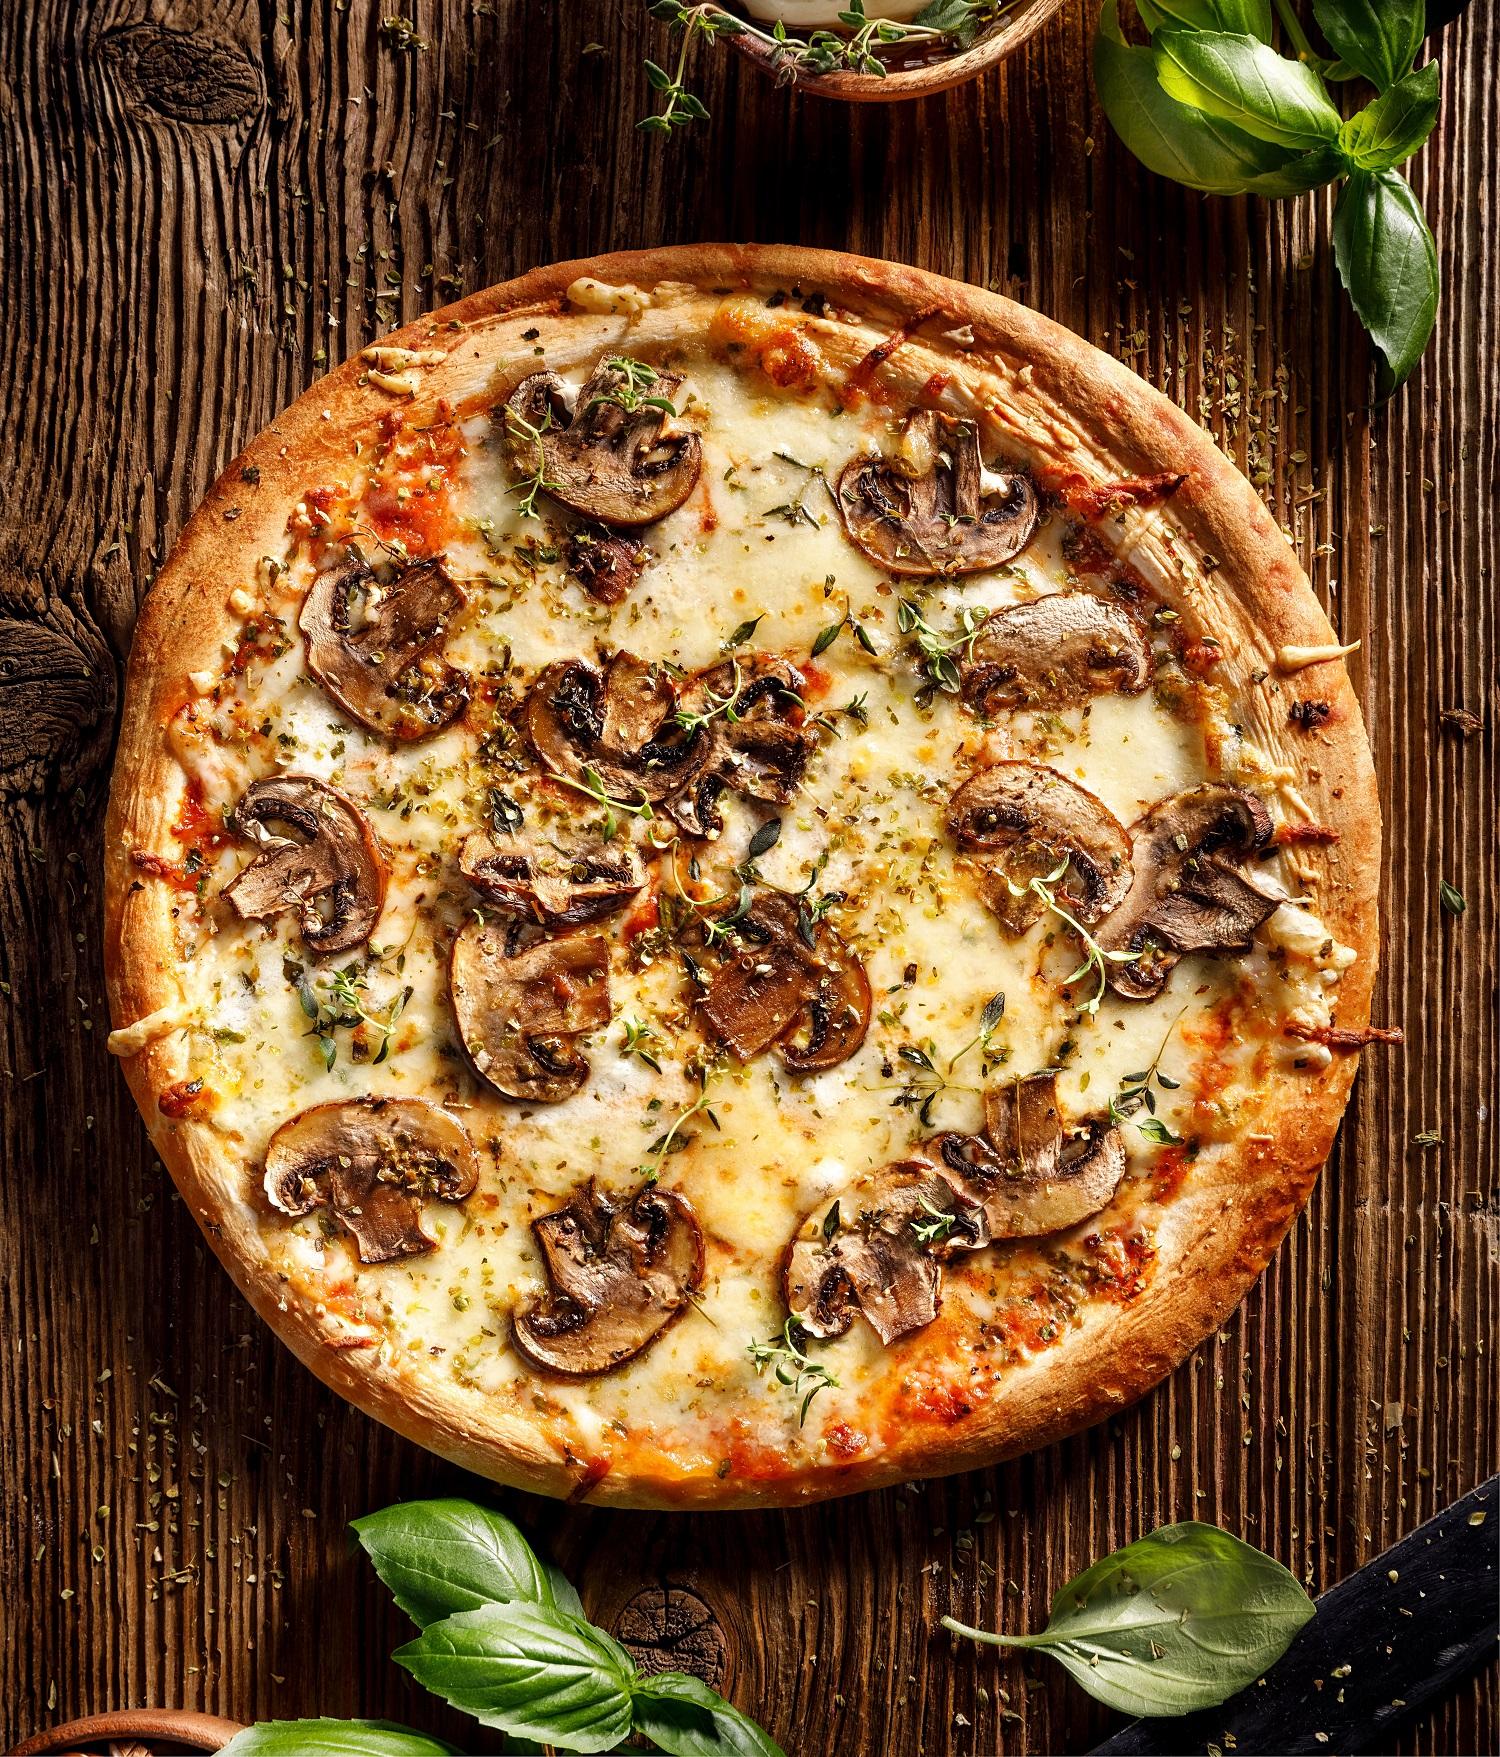 Mushroom magic pizza